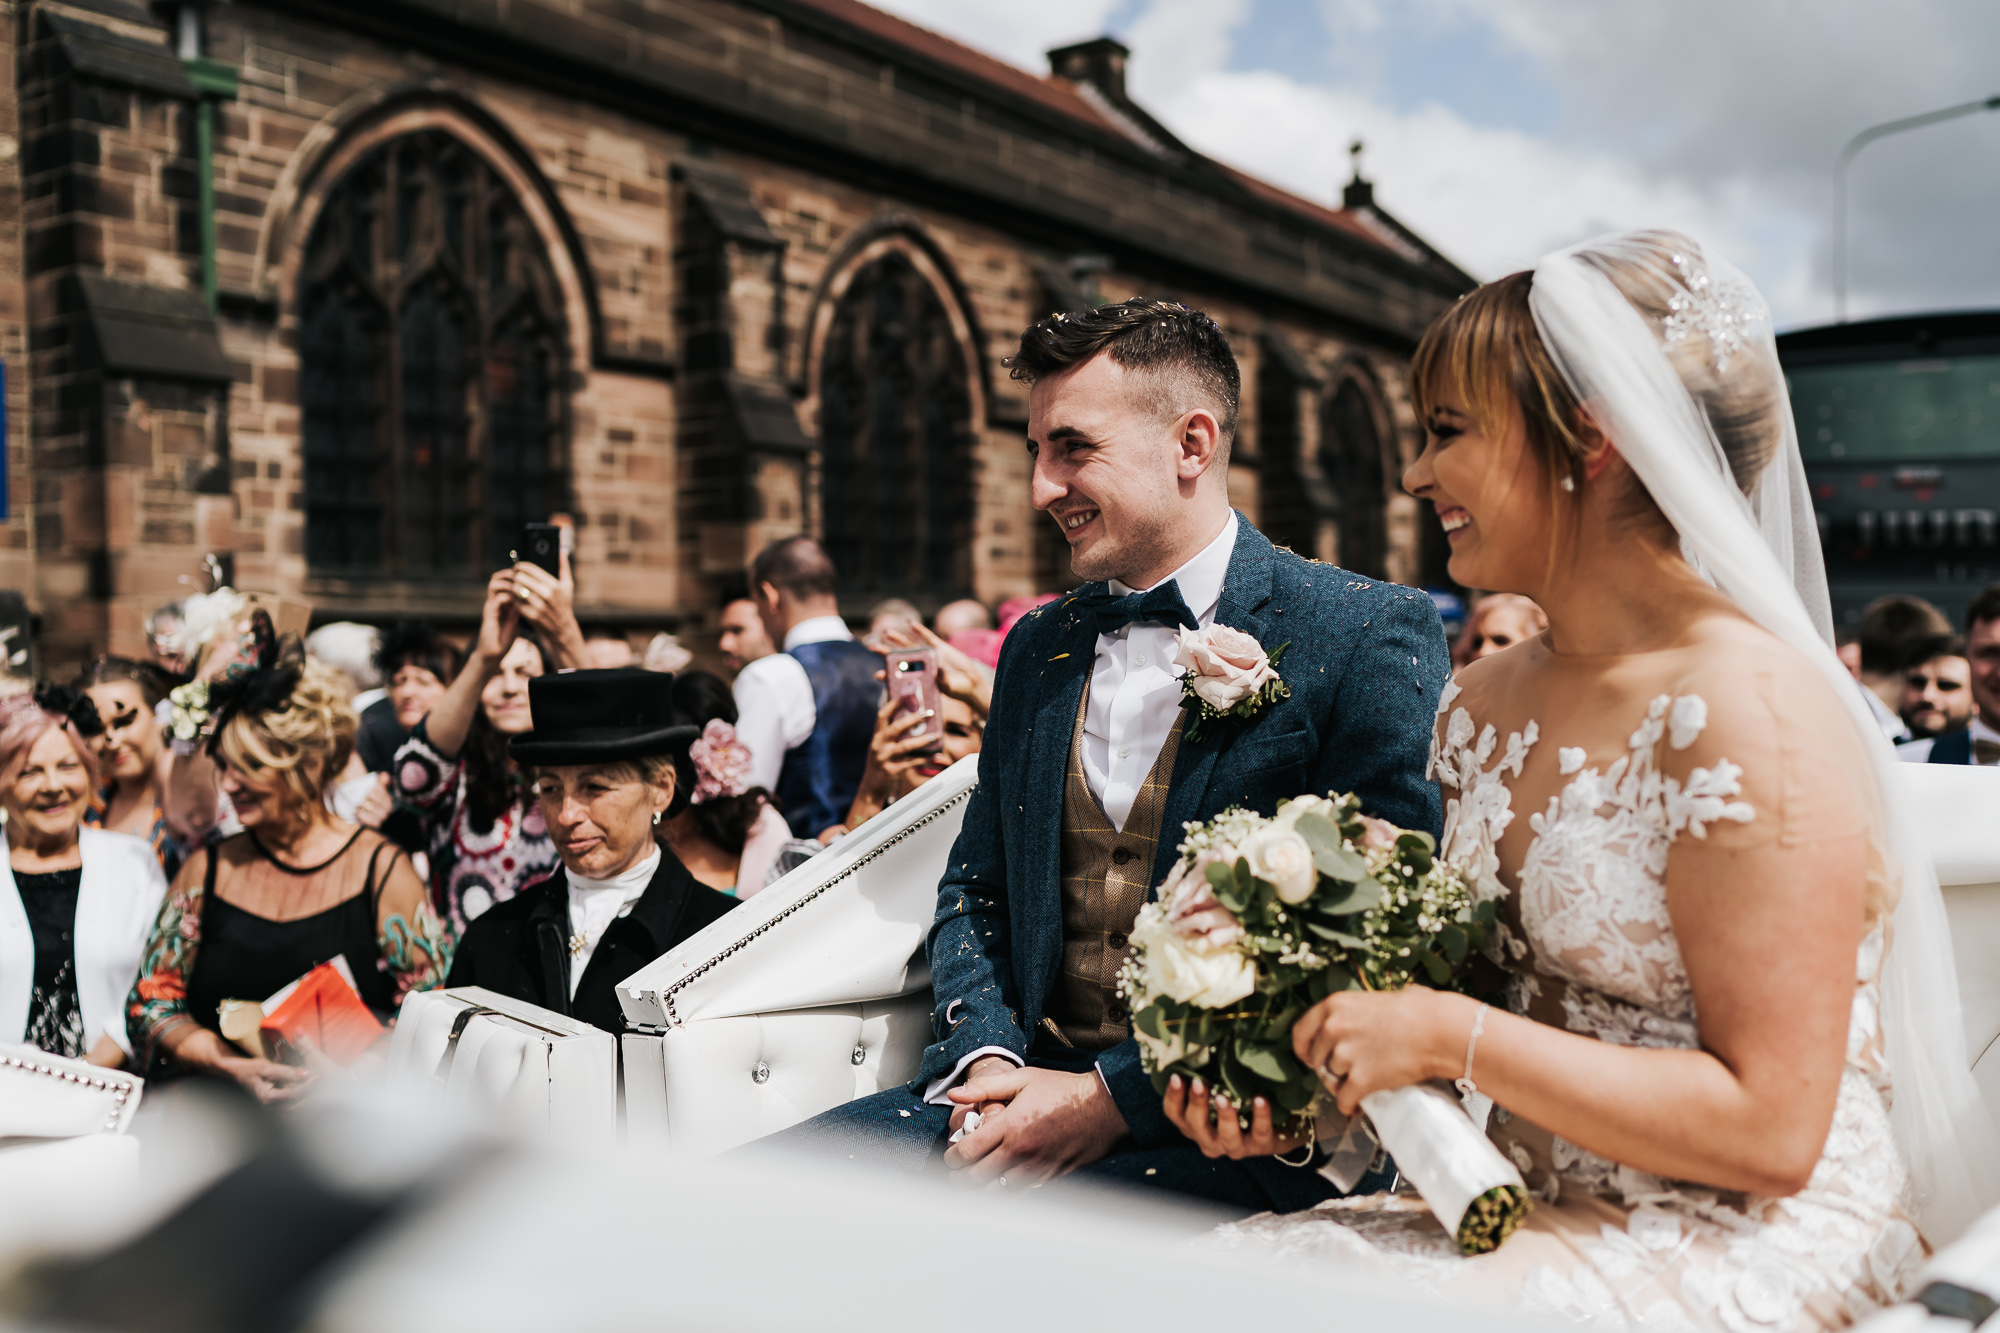 Rivington Hall Barn Wedding PHotographer lancashire wedding photography (19 of 34).jpg